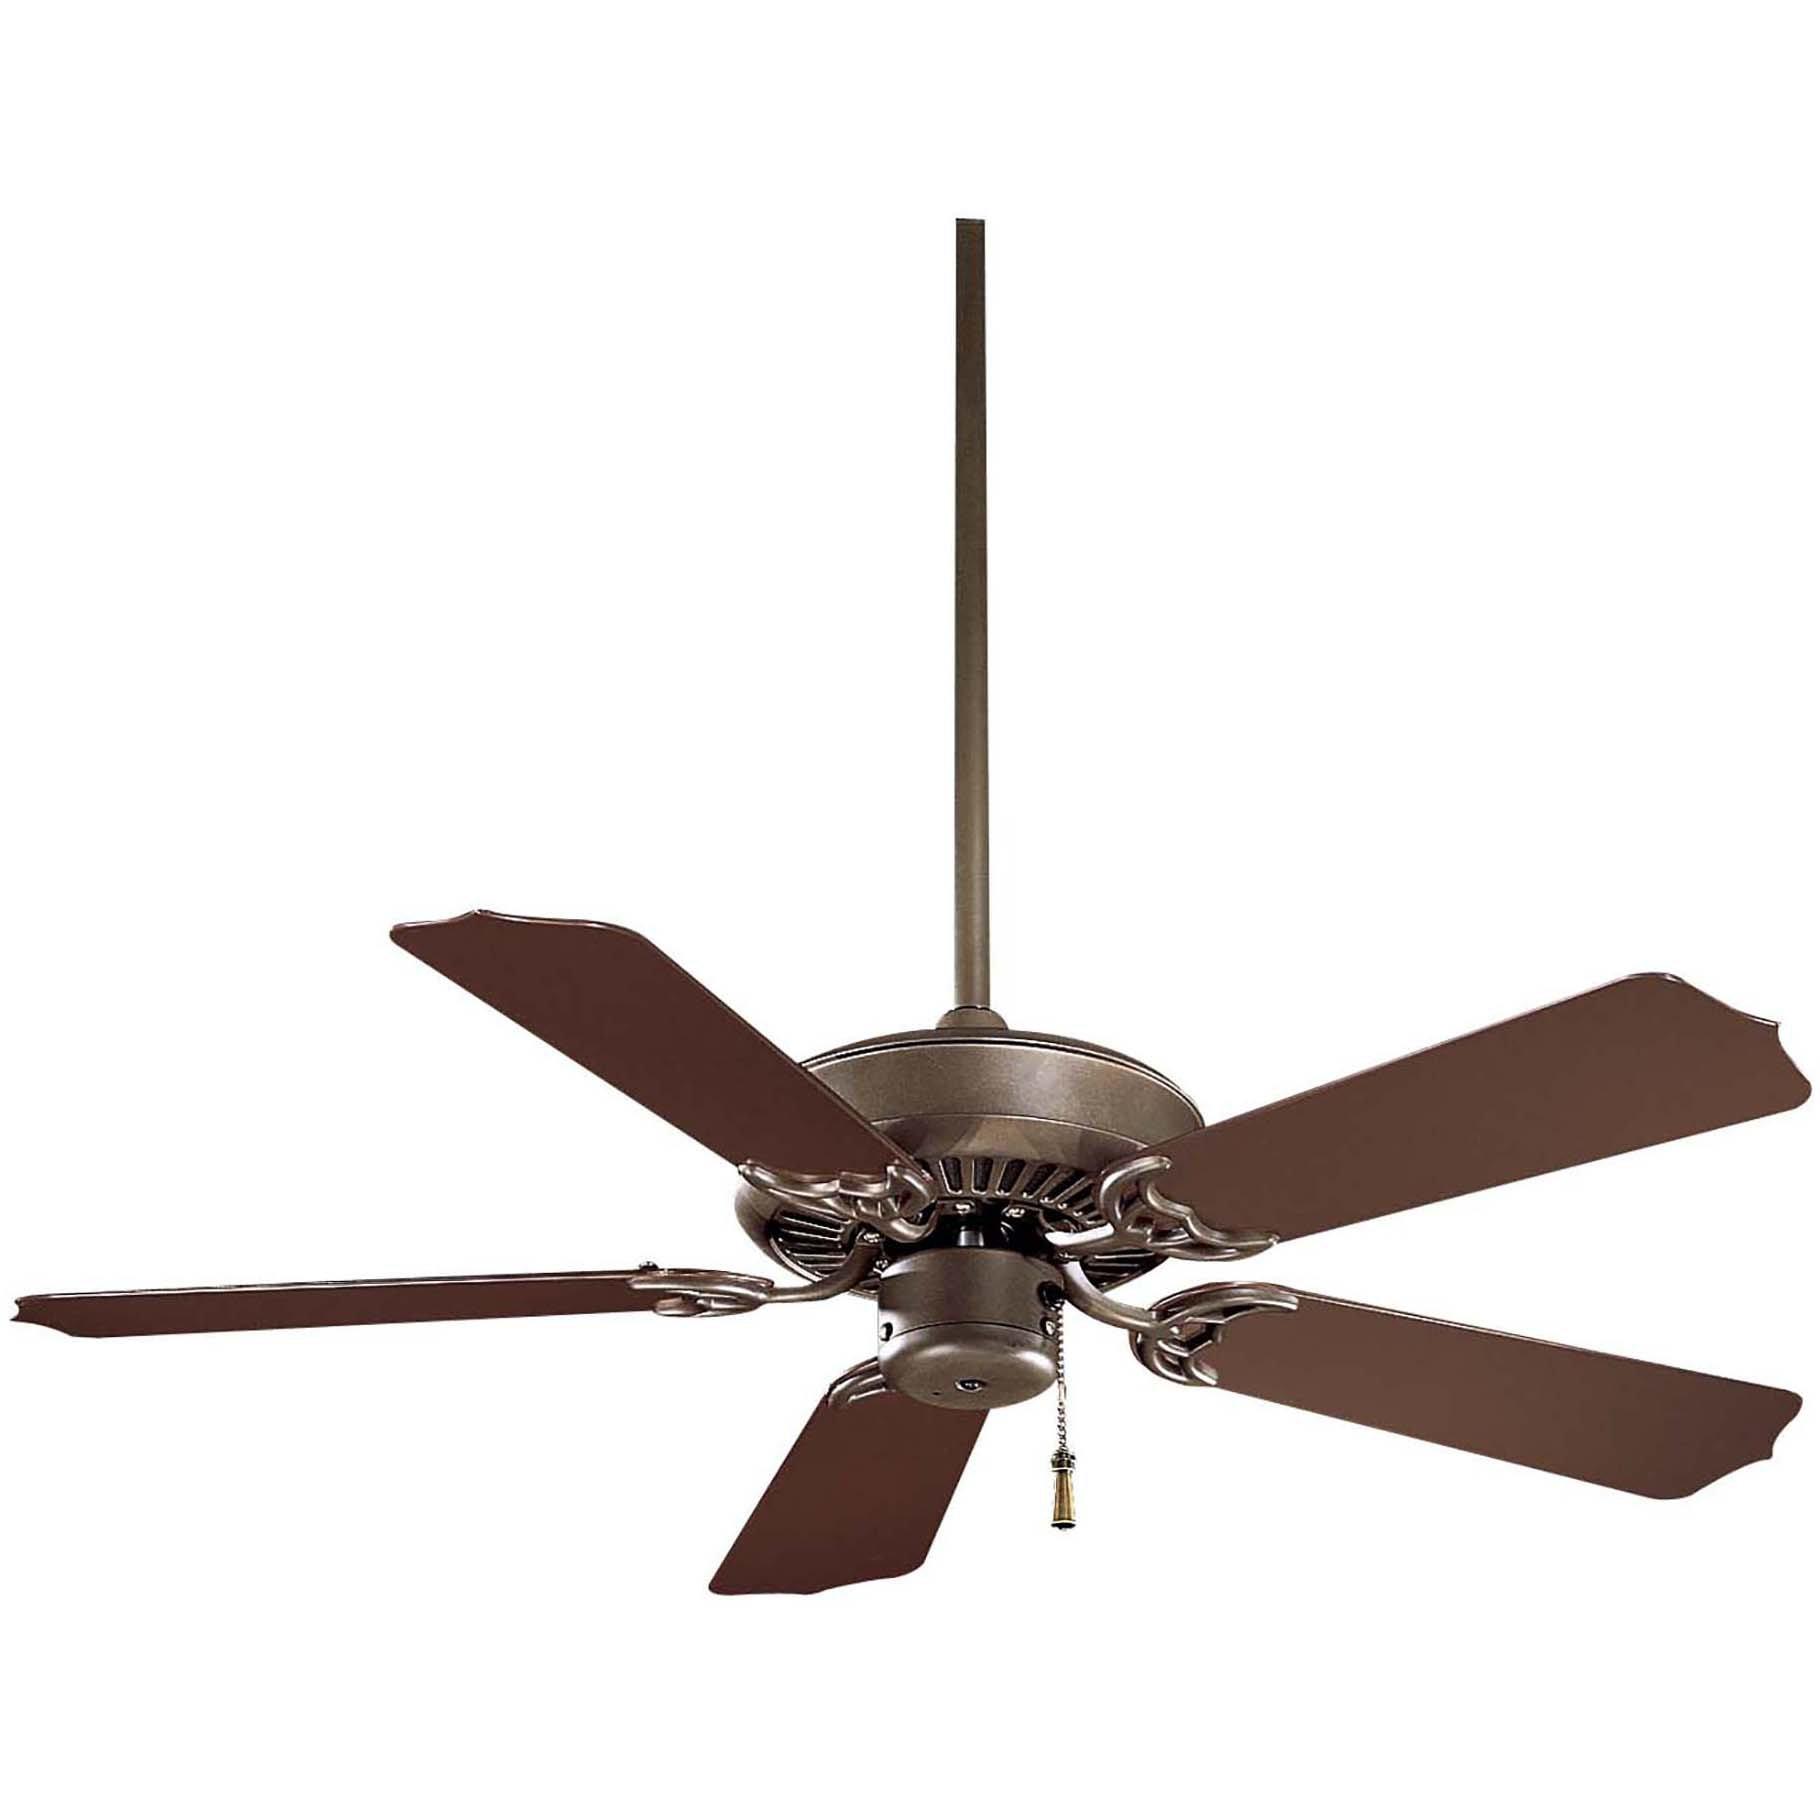 "Minka Aire 42"" Sundance 5 Blade Indoor Outdoor Ceiling Fan"